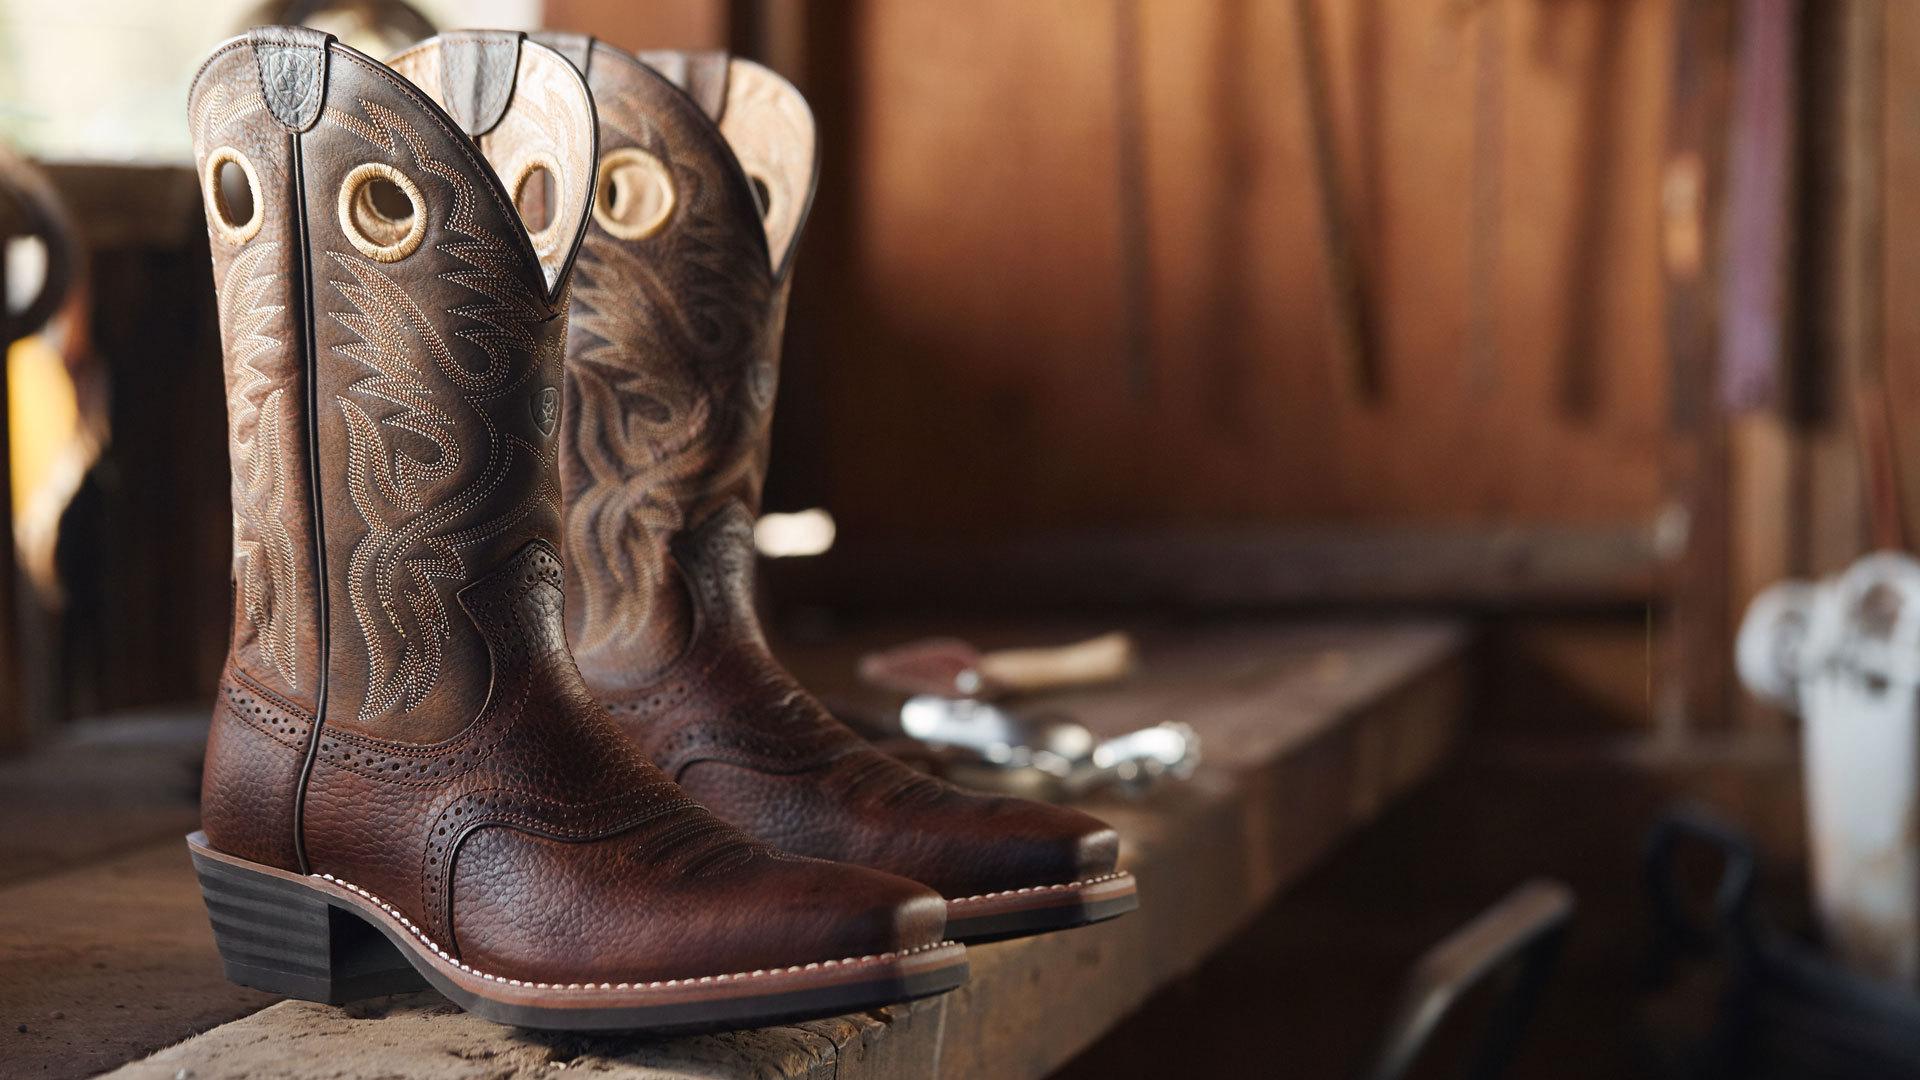 e60d51bc389 Cowboy Wear Stores Near Me | Toffee Art